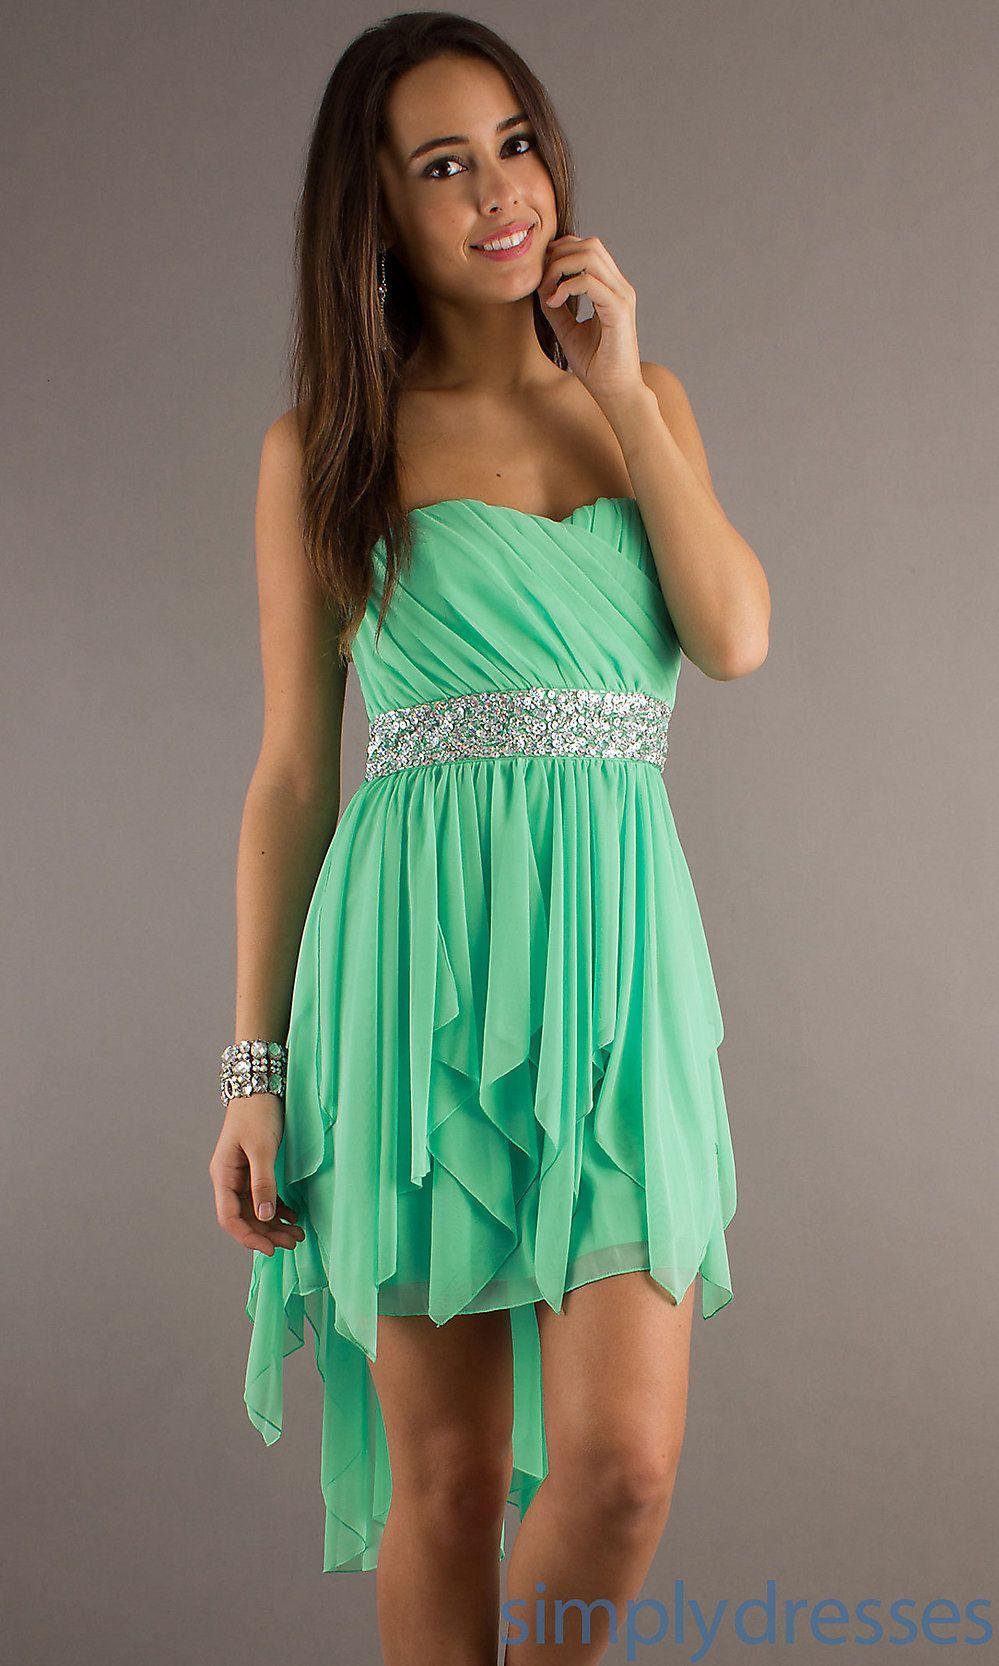 Tween dresses strapless long strapless high low dress for Wedding dresses for tweens